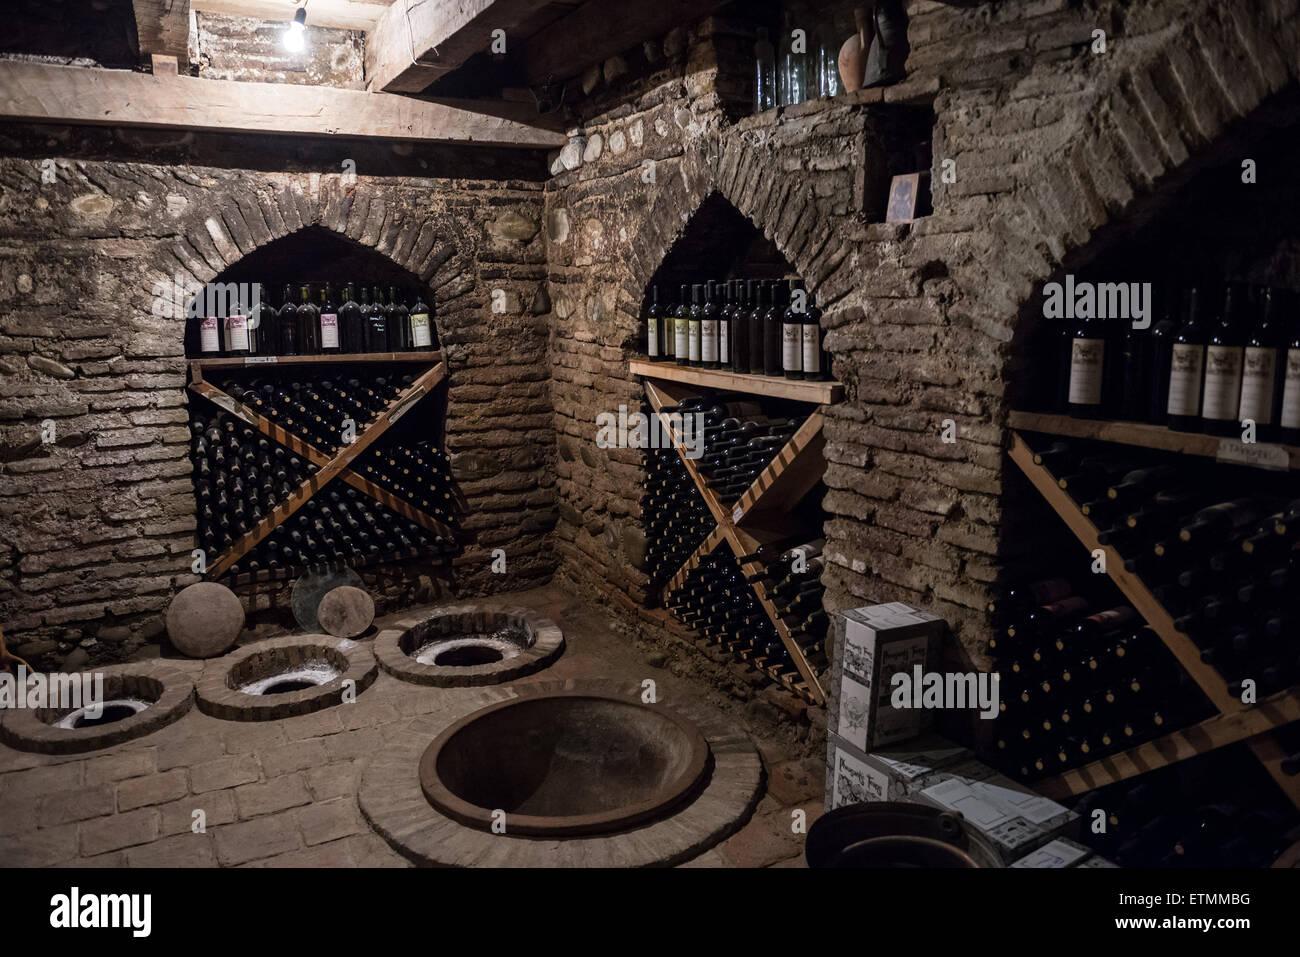 Kvevri Vessels In Wine Cellar